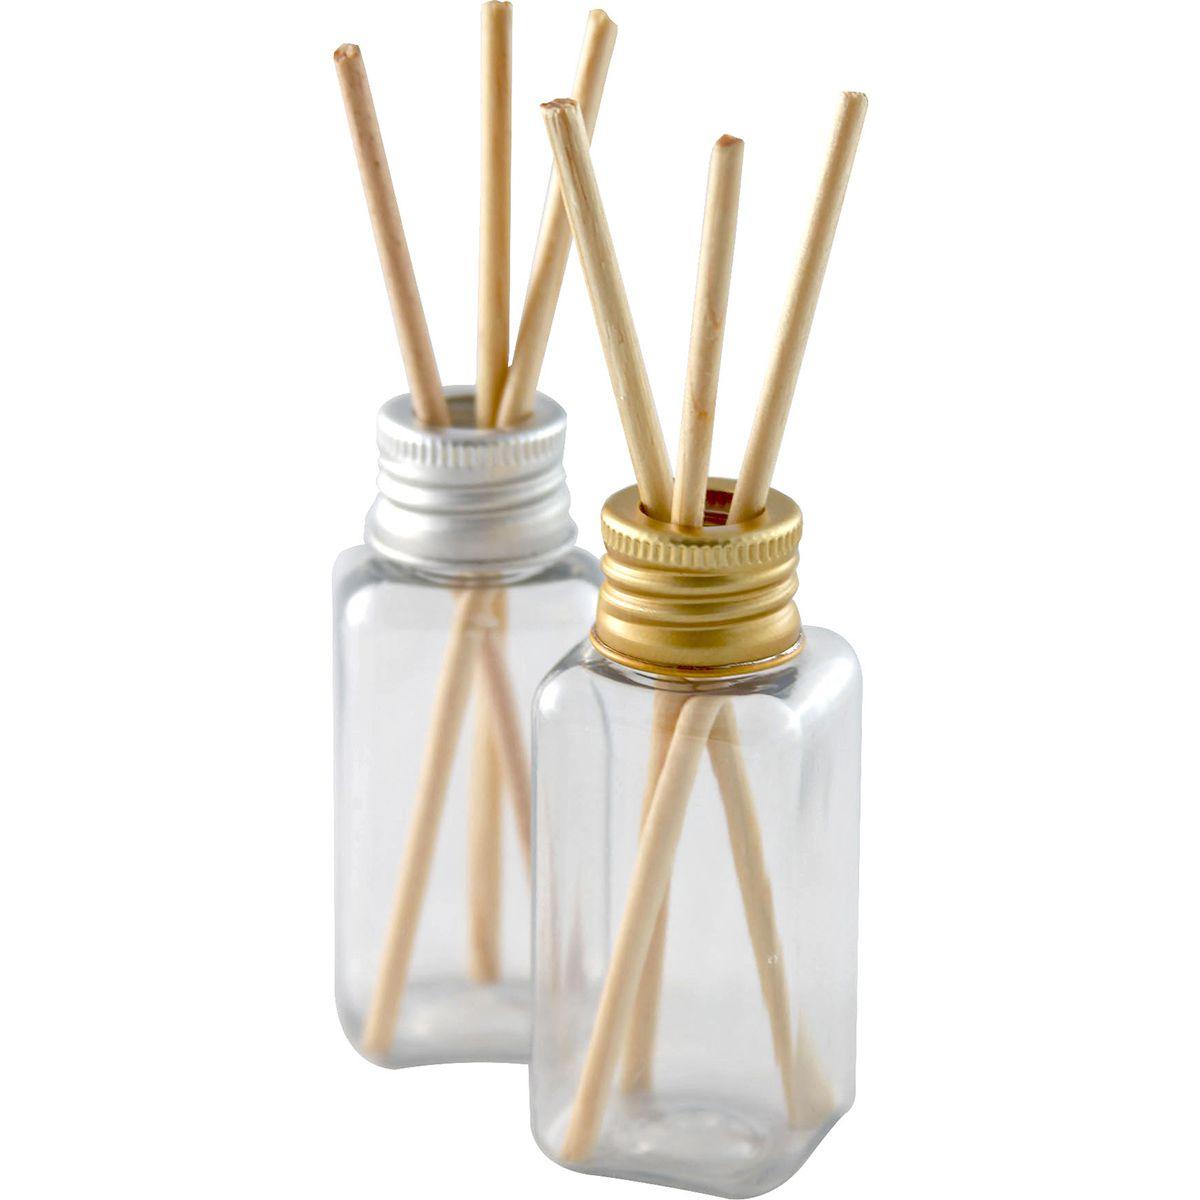 Frasco para Aromatizador Atacado Plástico de 40 ml kit com 50 unidades